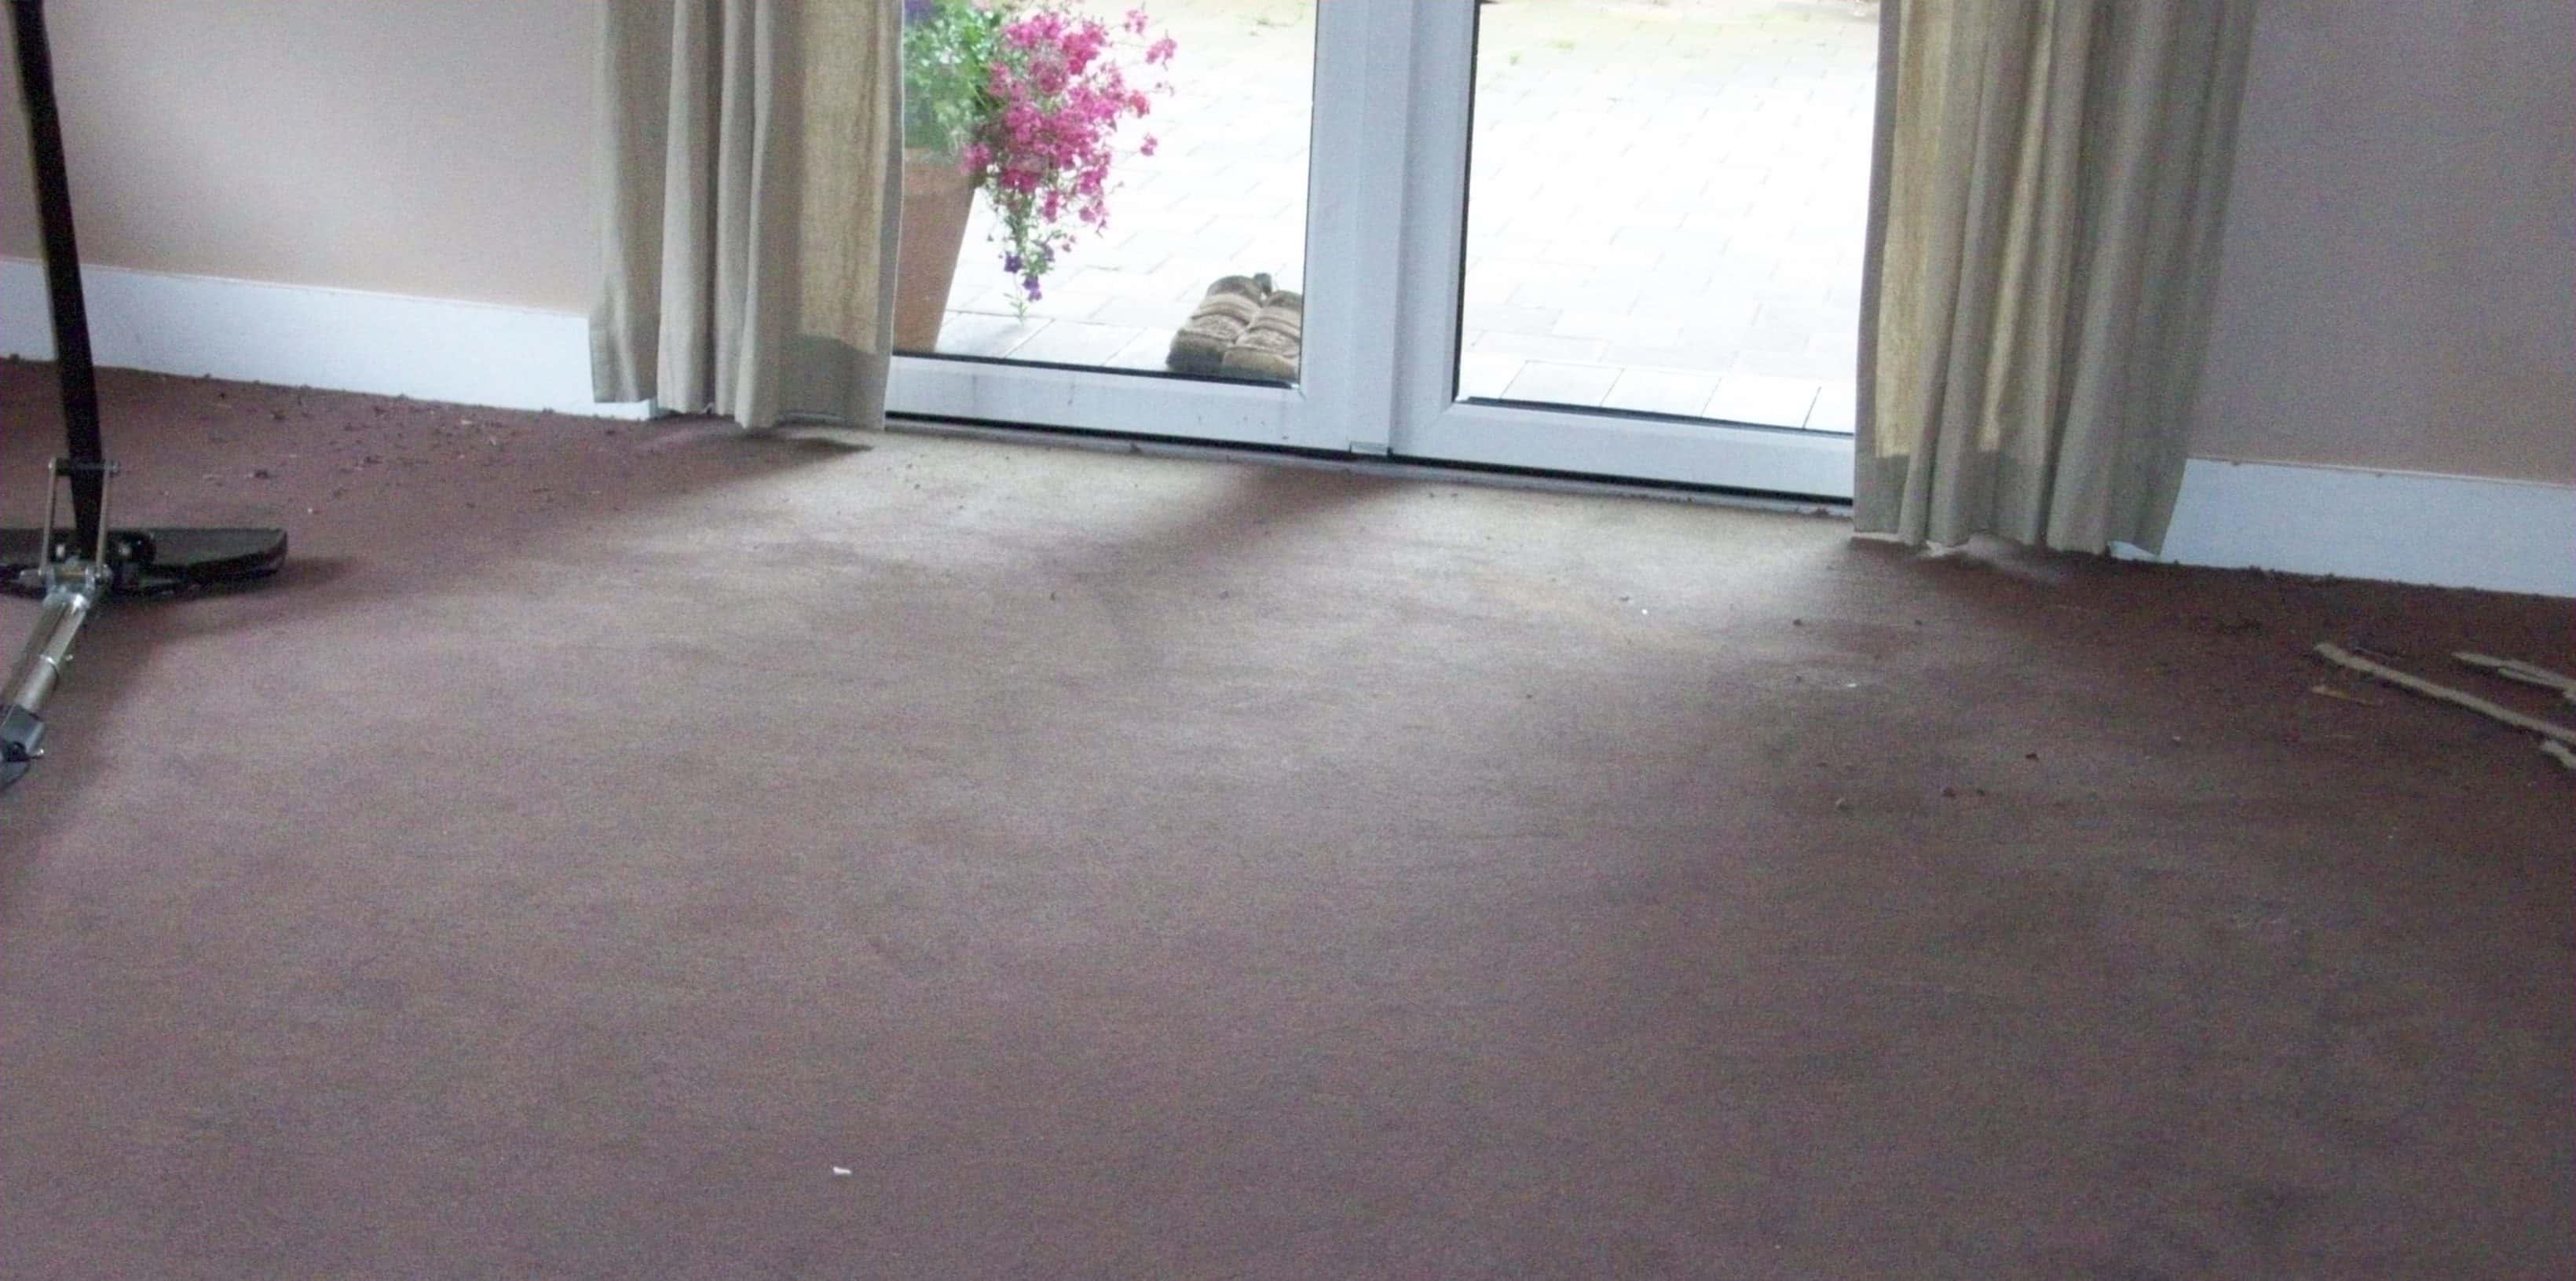 Carpet Stretching Premier Carpet Cleaning